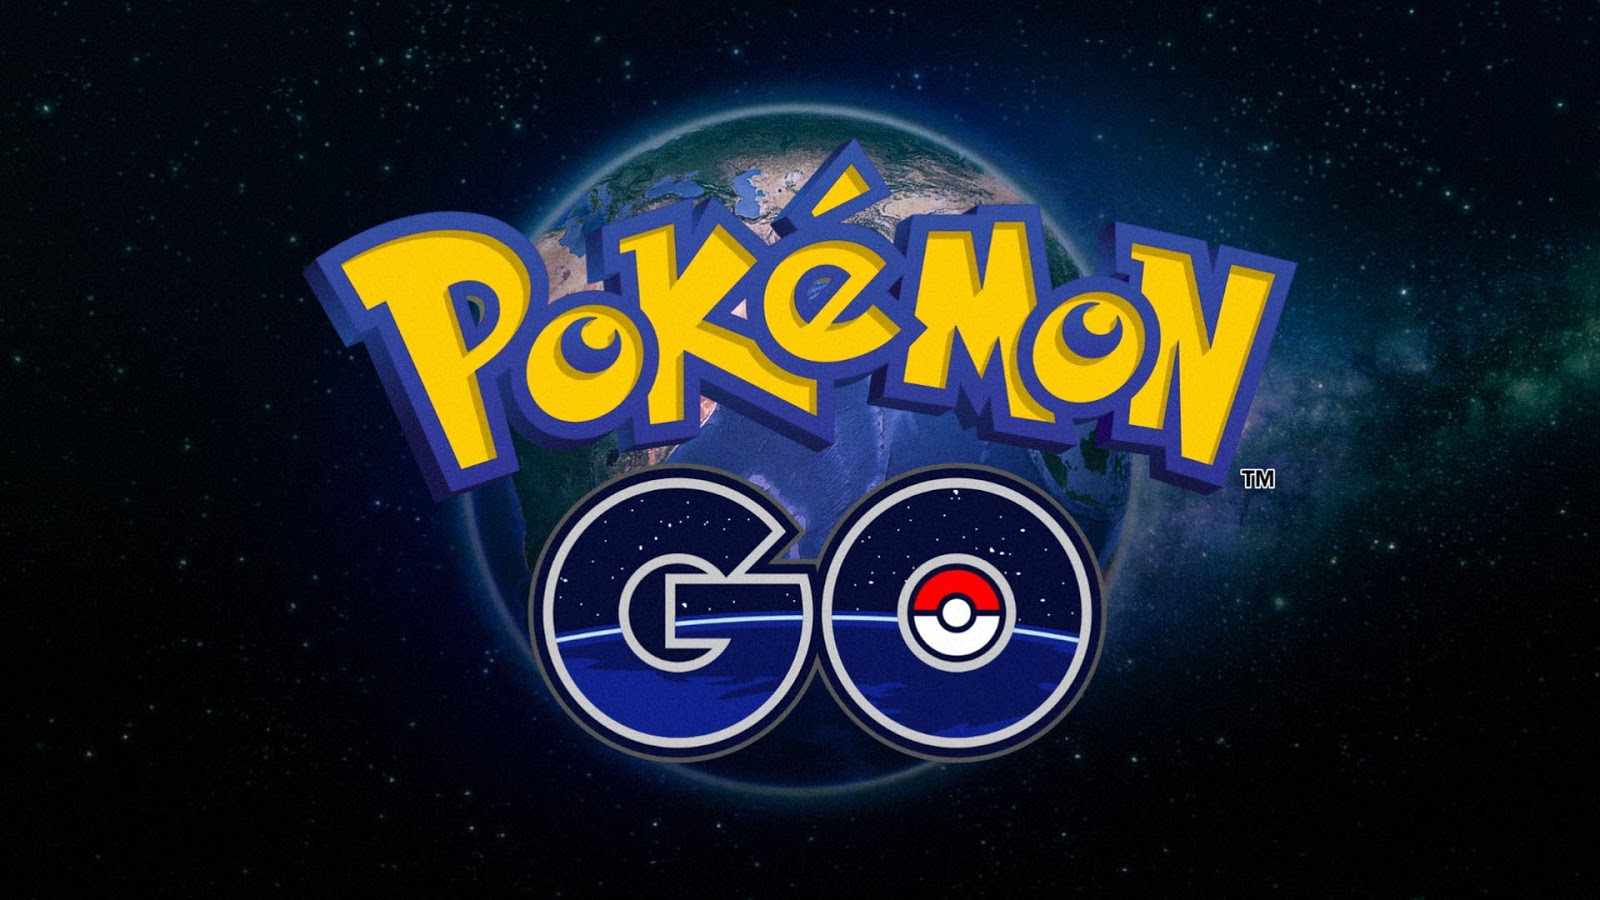 maxresdefault - Pokemon GO 出現永久封鎖!原因尚不明,一齊來分享